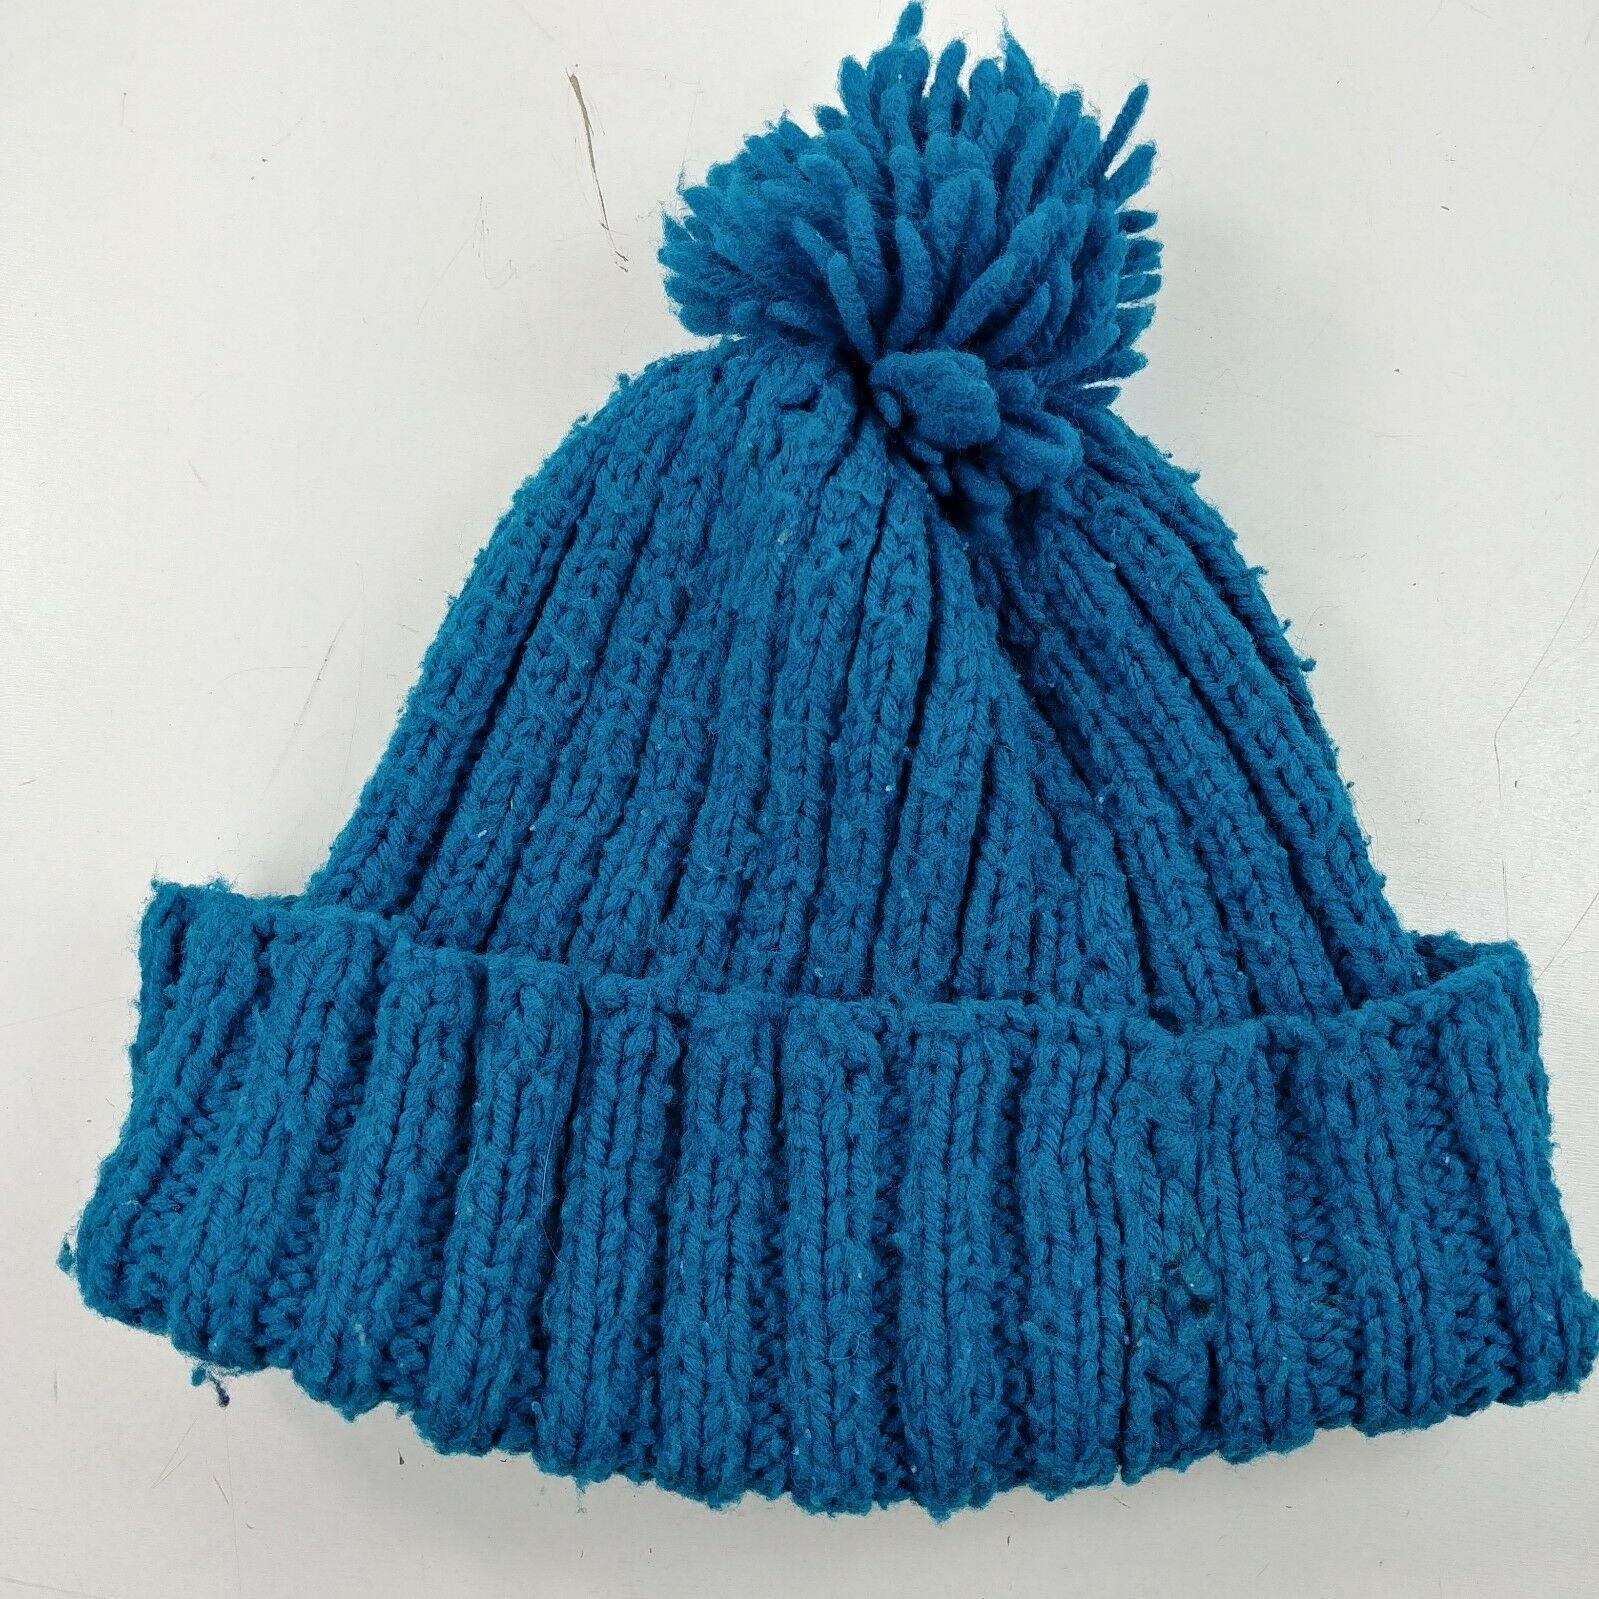 6a9c2afa 8 Hat Lot - Knit Face Beanie Pom Fuzzy Skull Cap Winter Rainbow